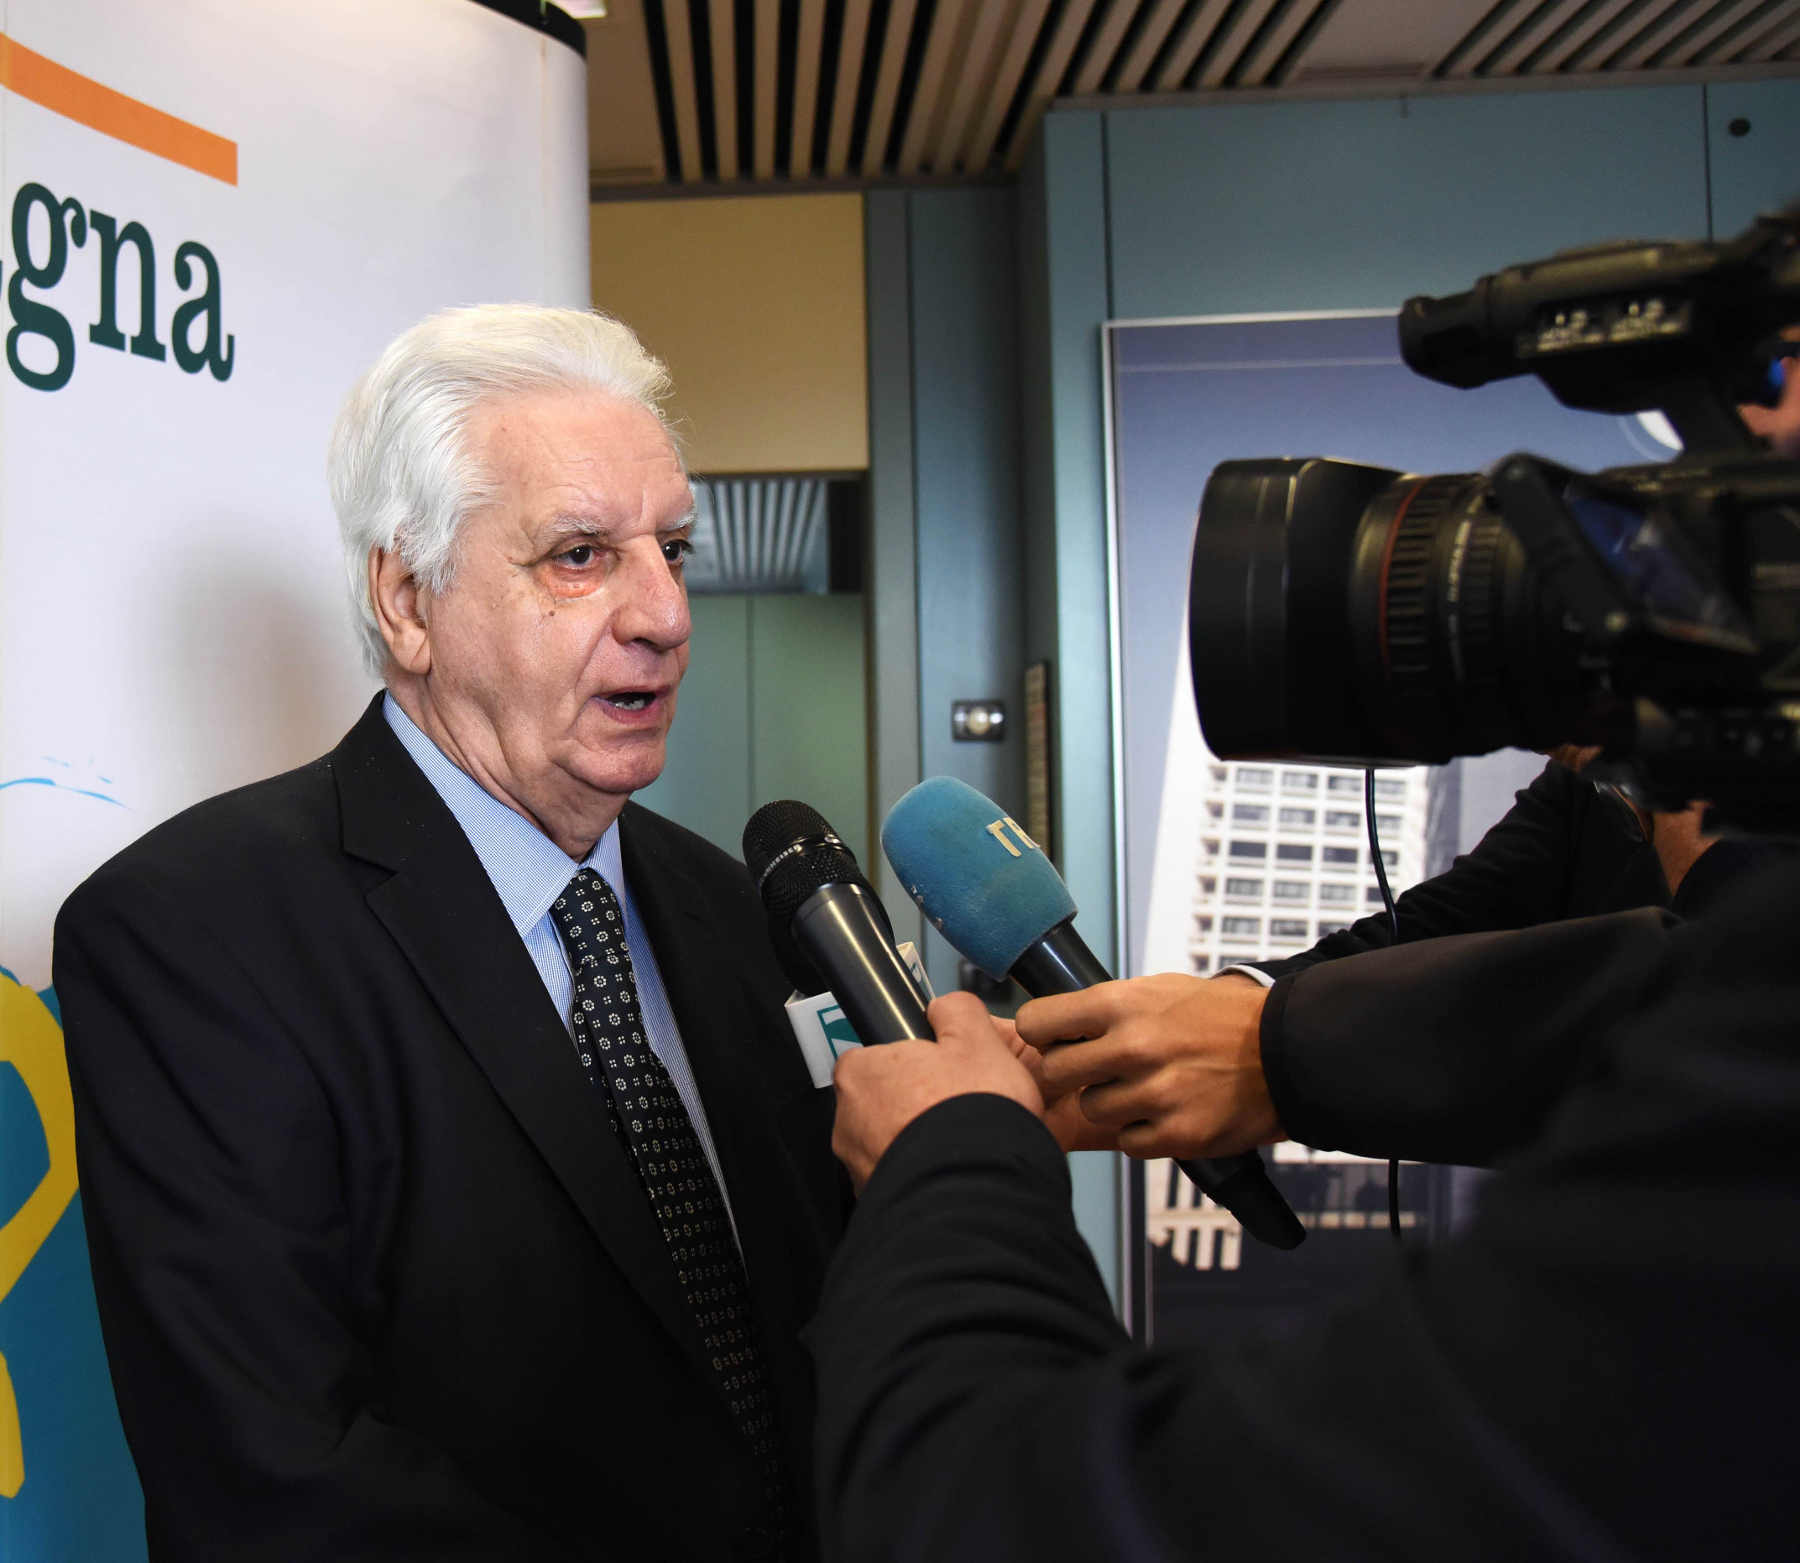 Confermata presidenza  Enoteca Regionale Emilia Romagna